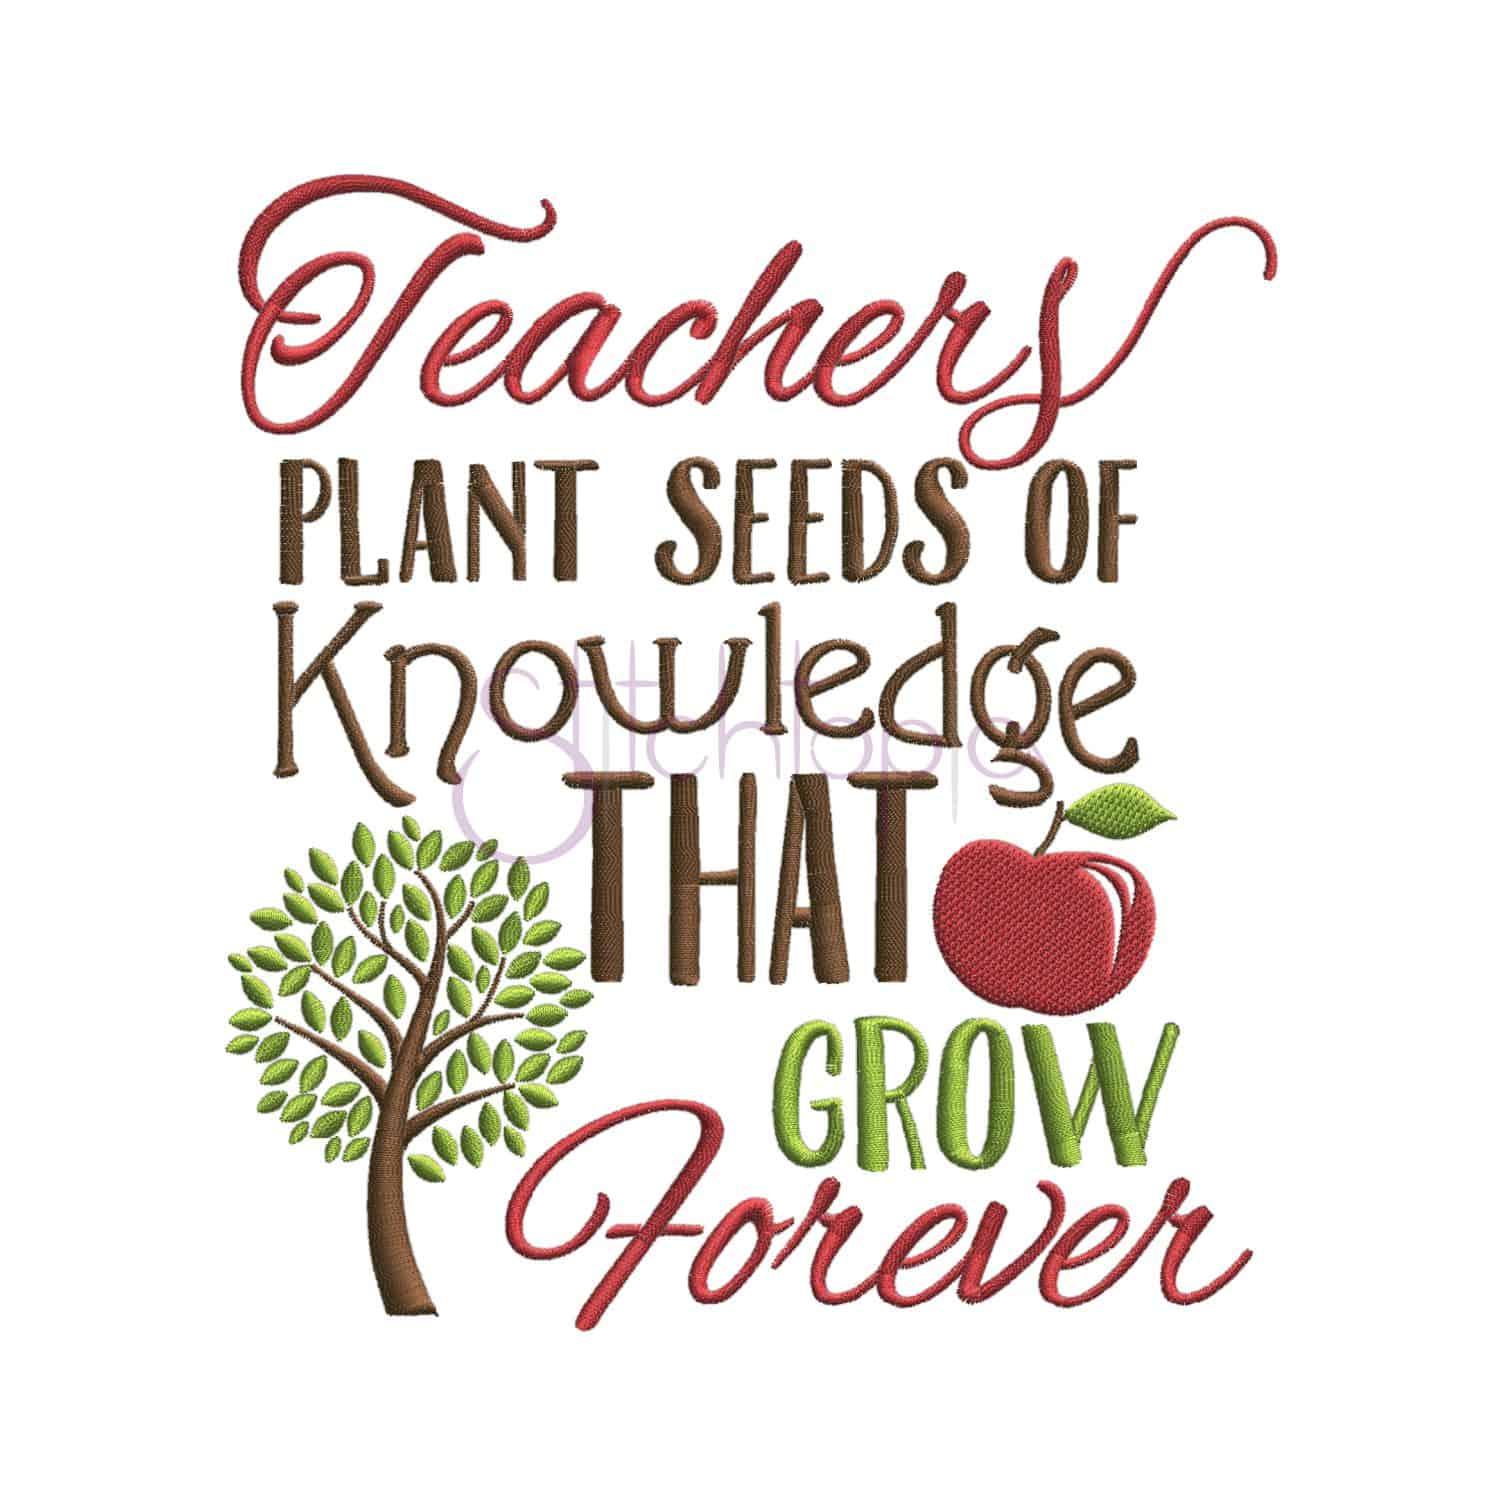 Teachers plant seeds embroidery design stitchtopia